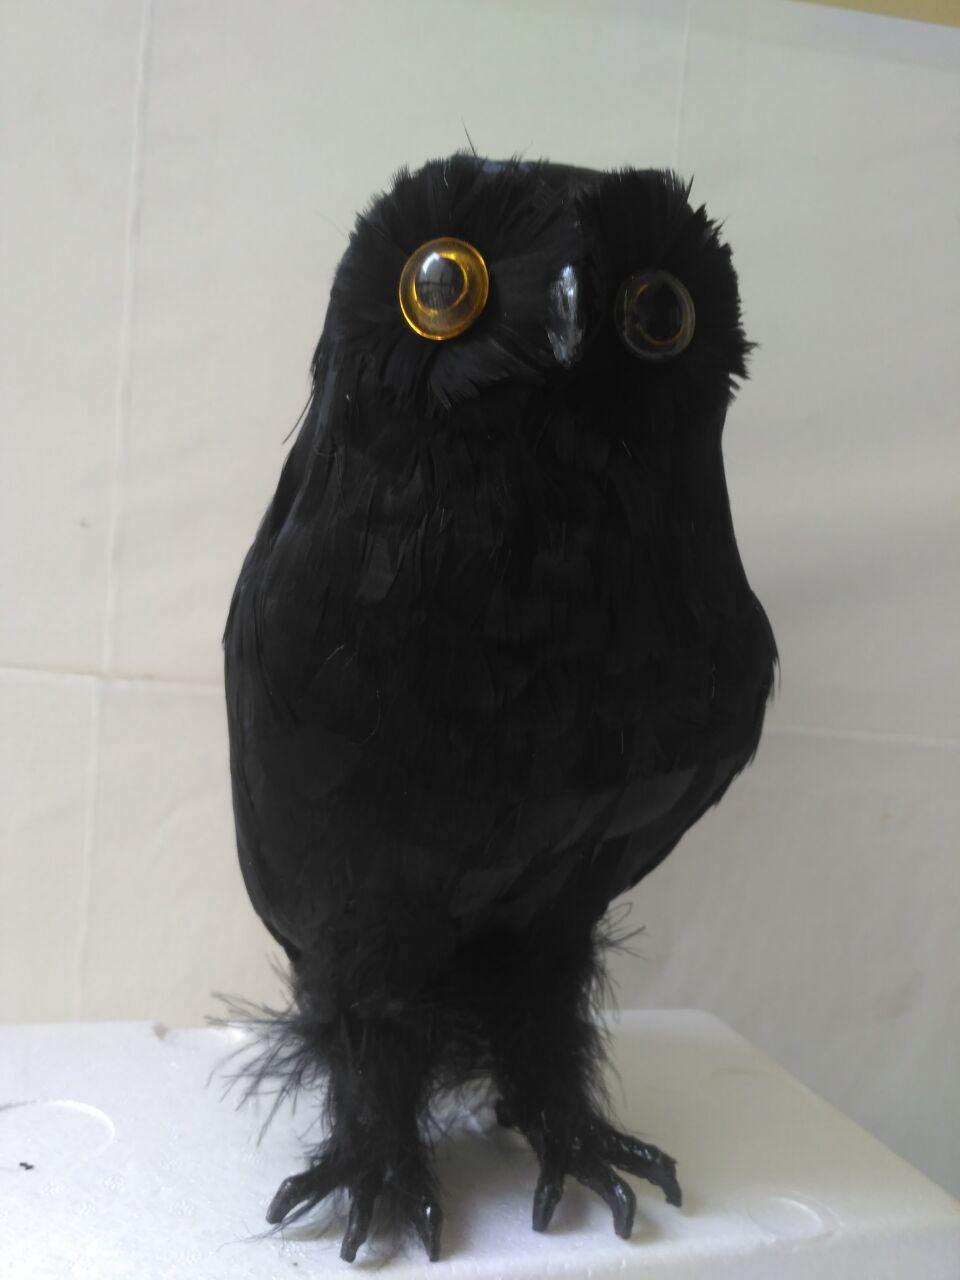 big black simulation owl model foam&feather owl doll gift about 28cm